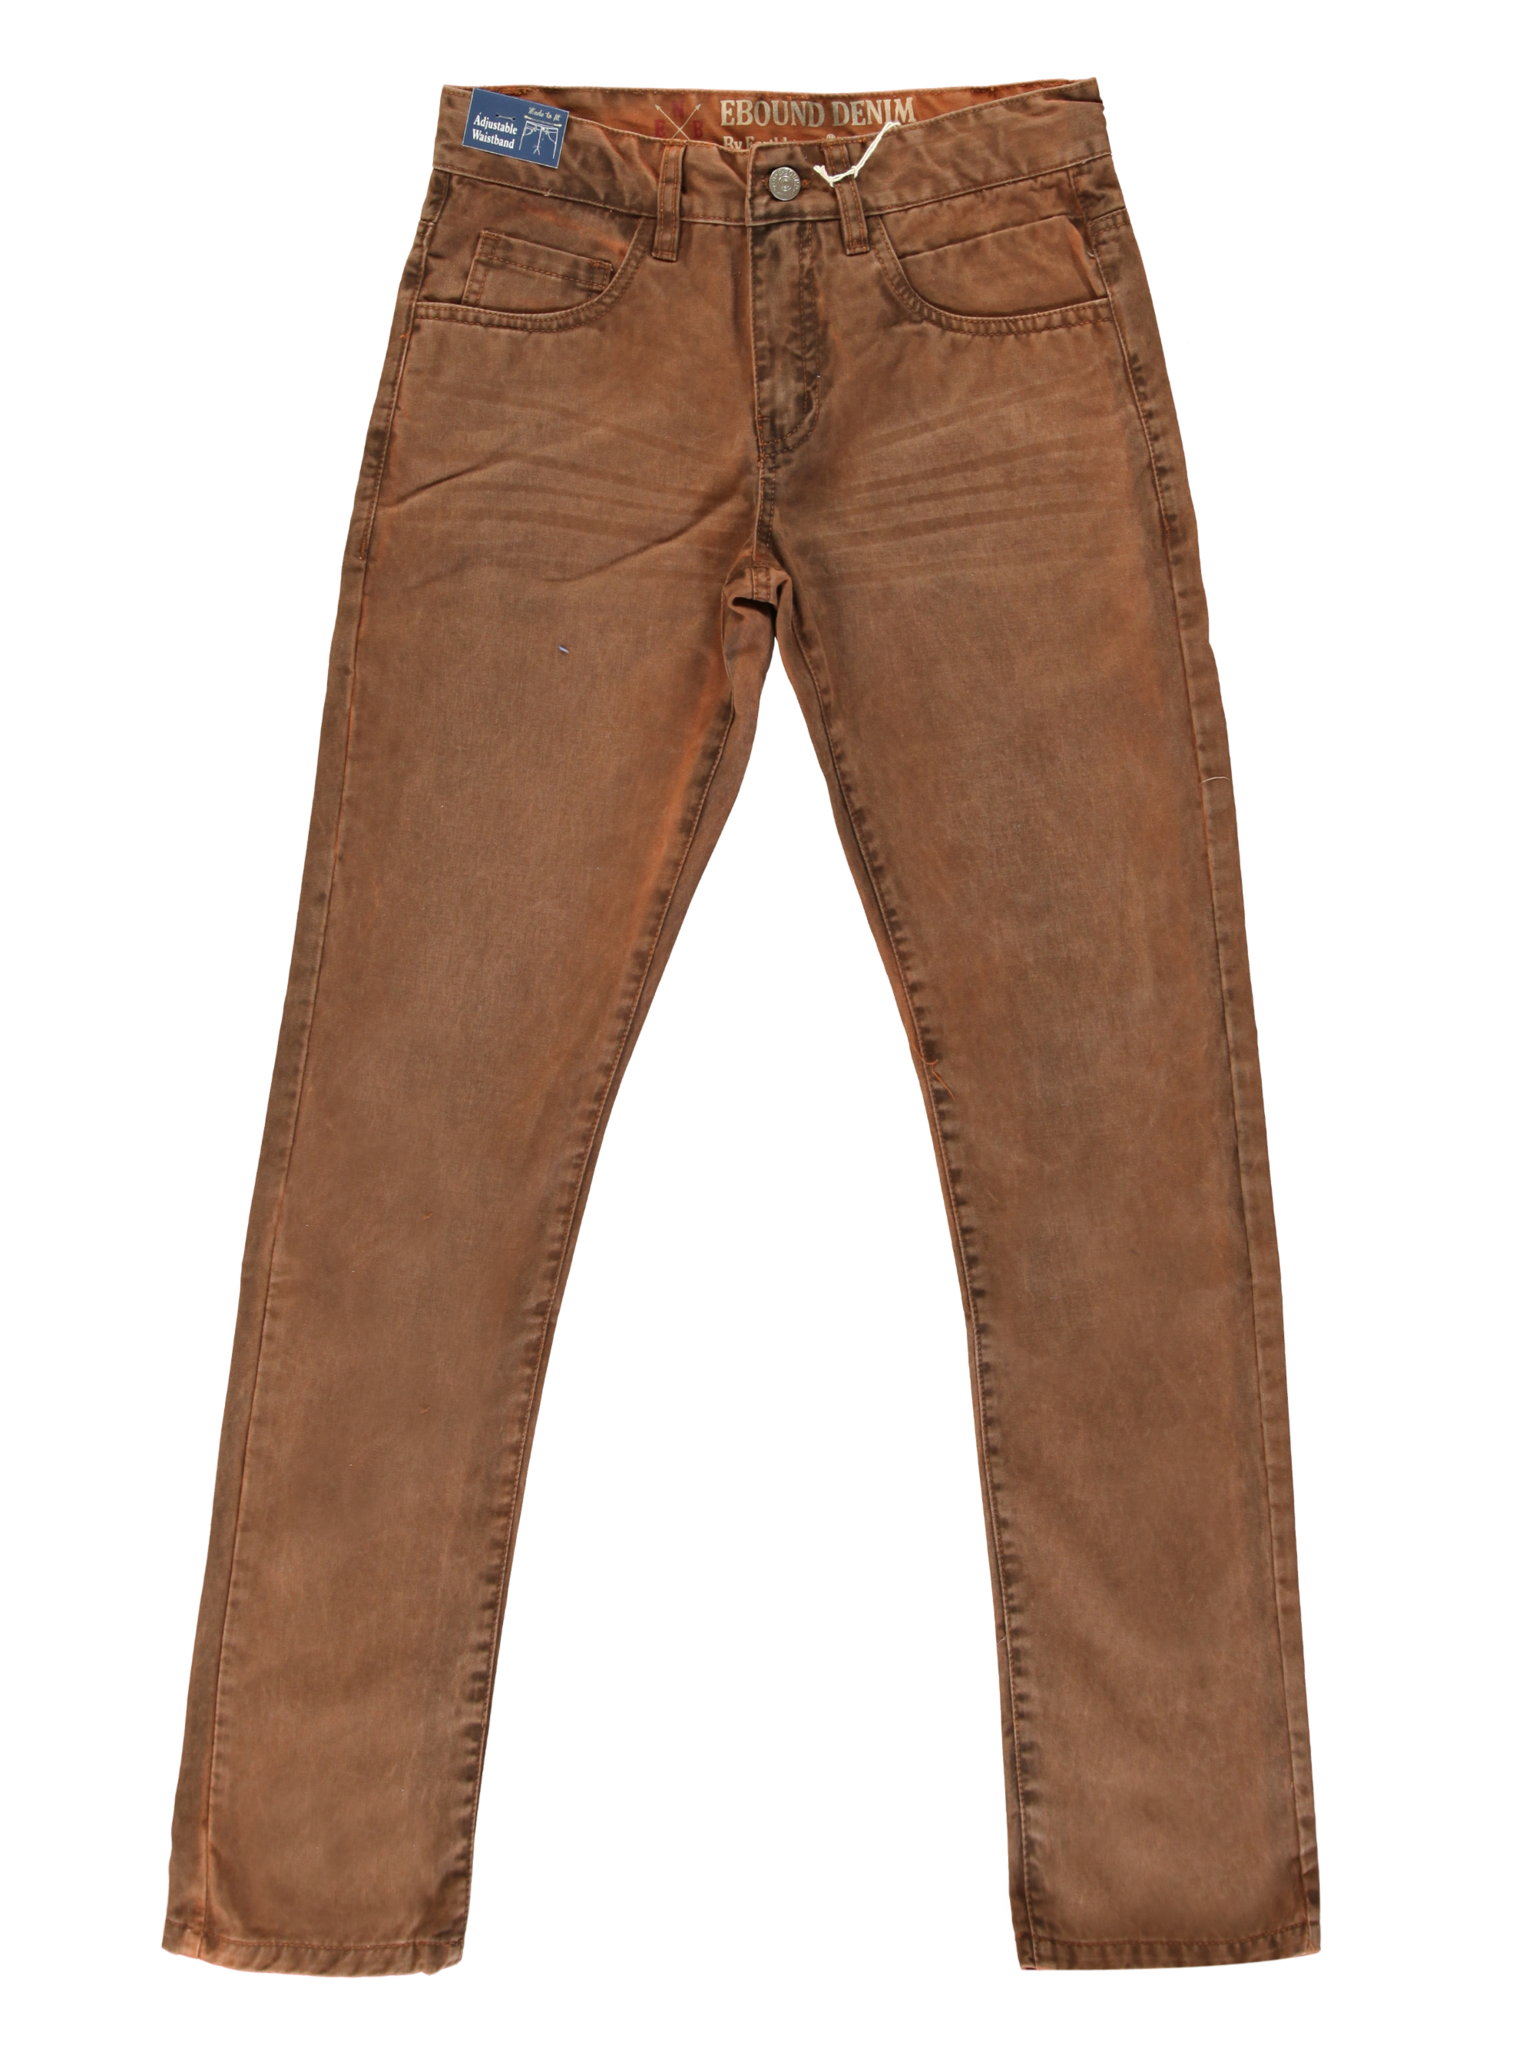 All Brands   Winterproducts Teen Boys   Pants   16 pcs/box